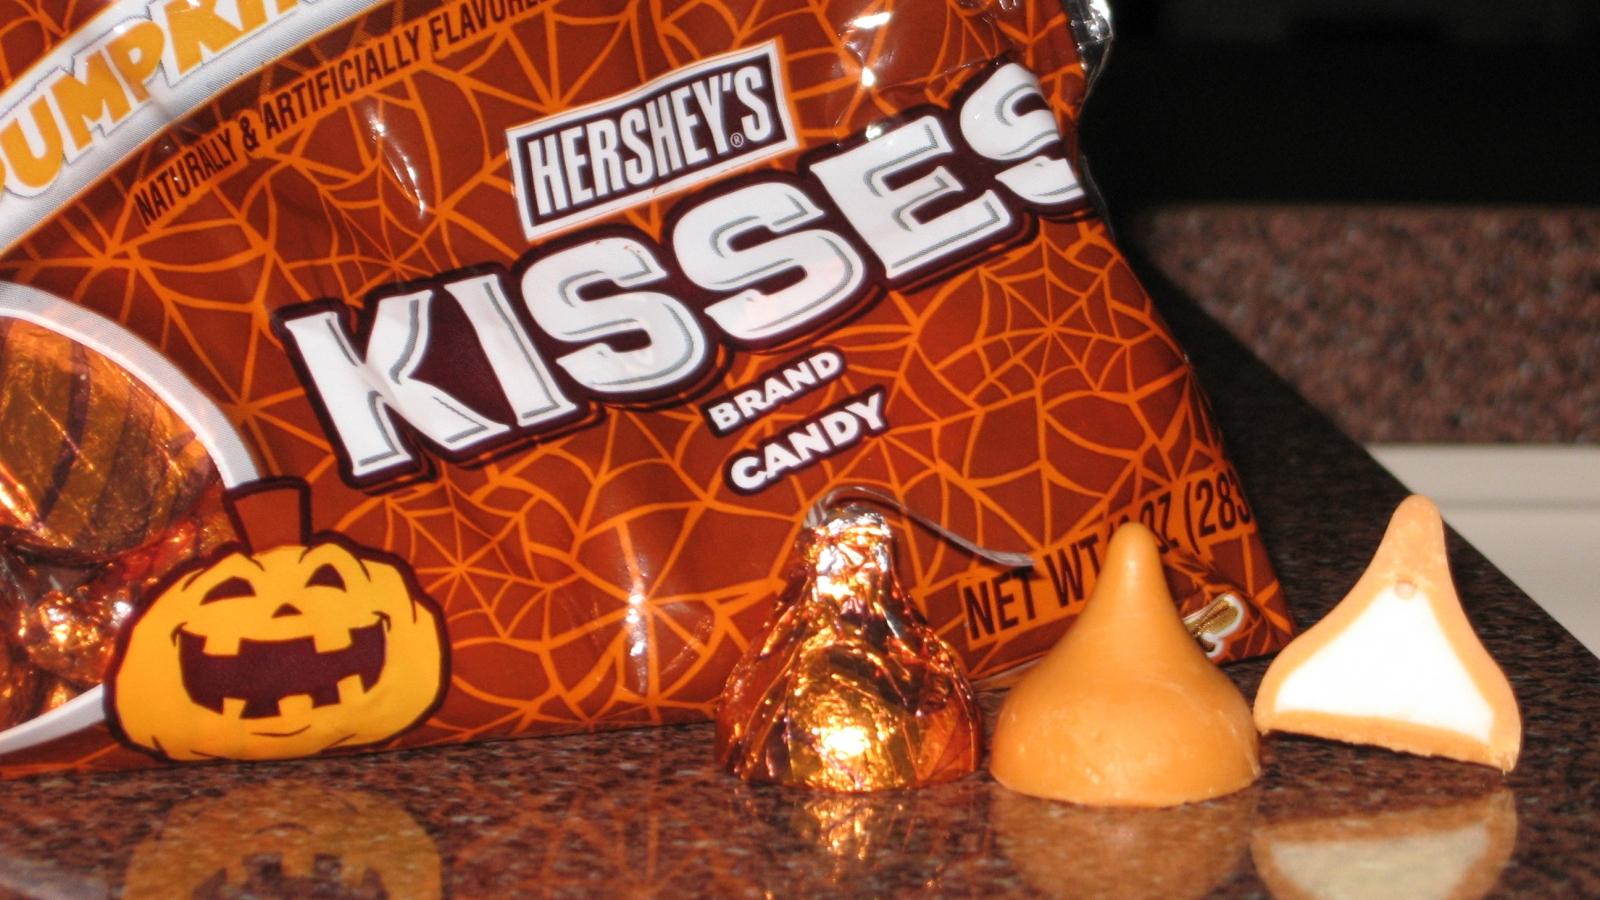 download Hershey Kisses Wallpaper Spice hershey kisses 1600x900